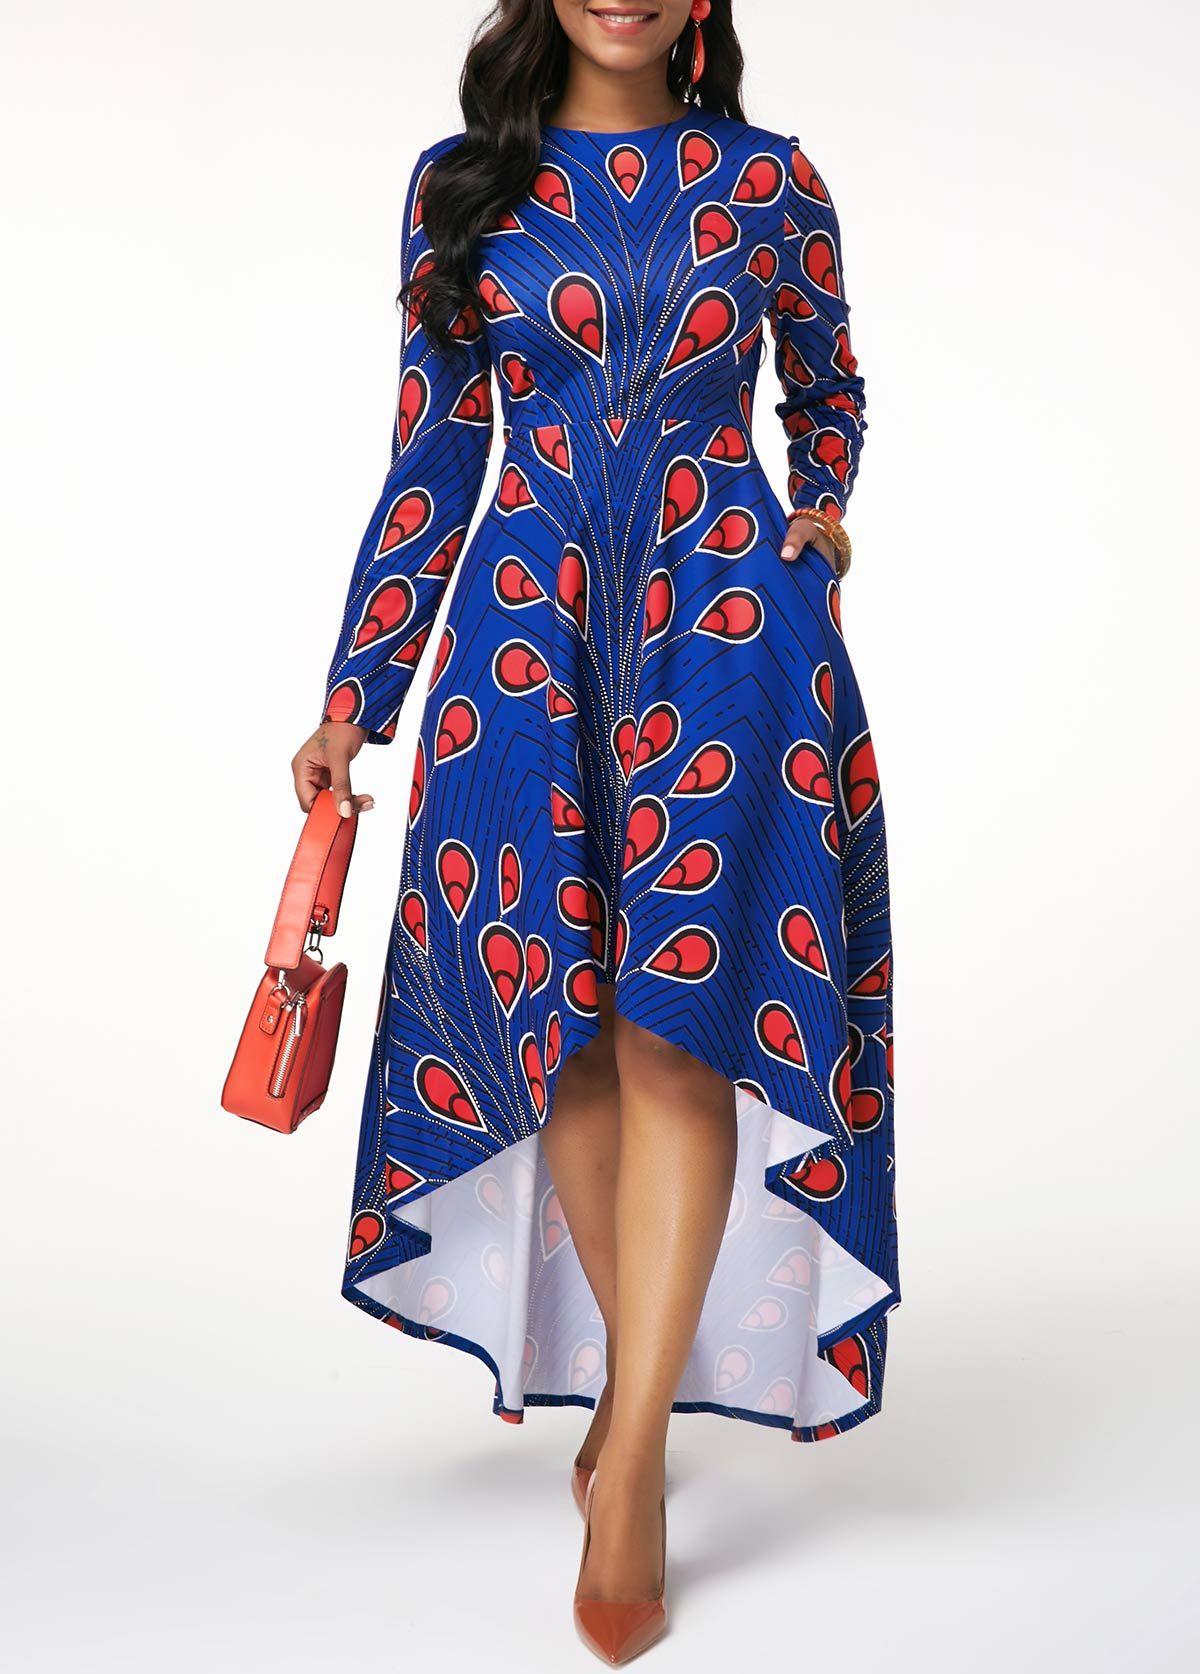 Zipper Back High Waist Printed Dress Rosewe Com Usd 29 50 Long Sleeve High Low Dress High Low Dress Dresses [ 1674 x 1200 Pixel ]